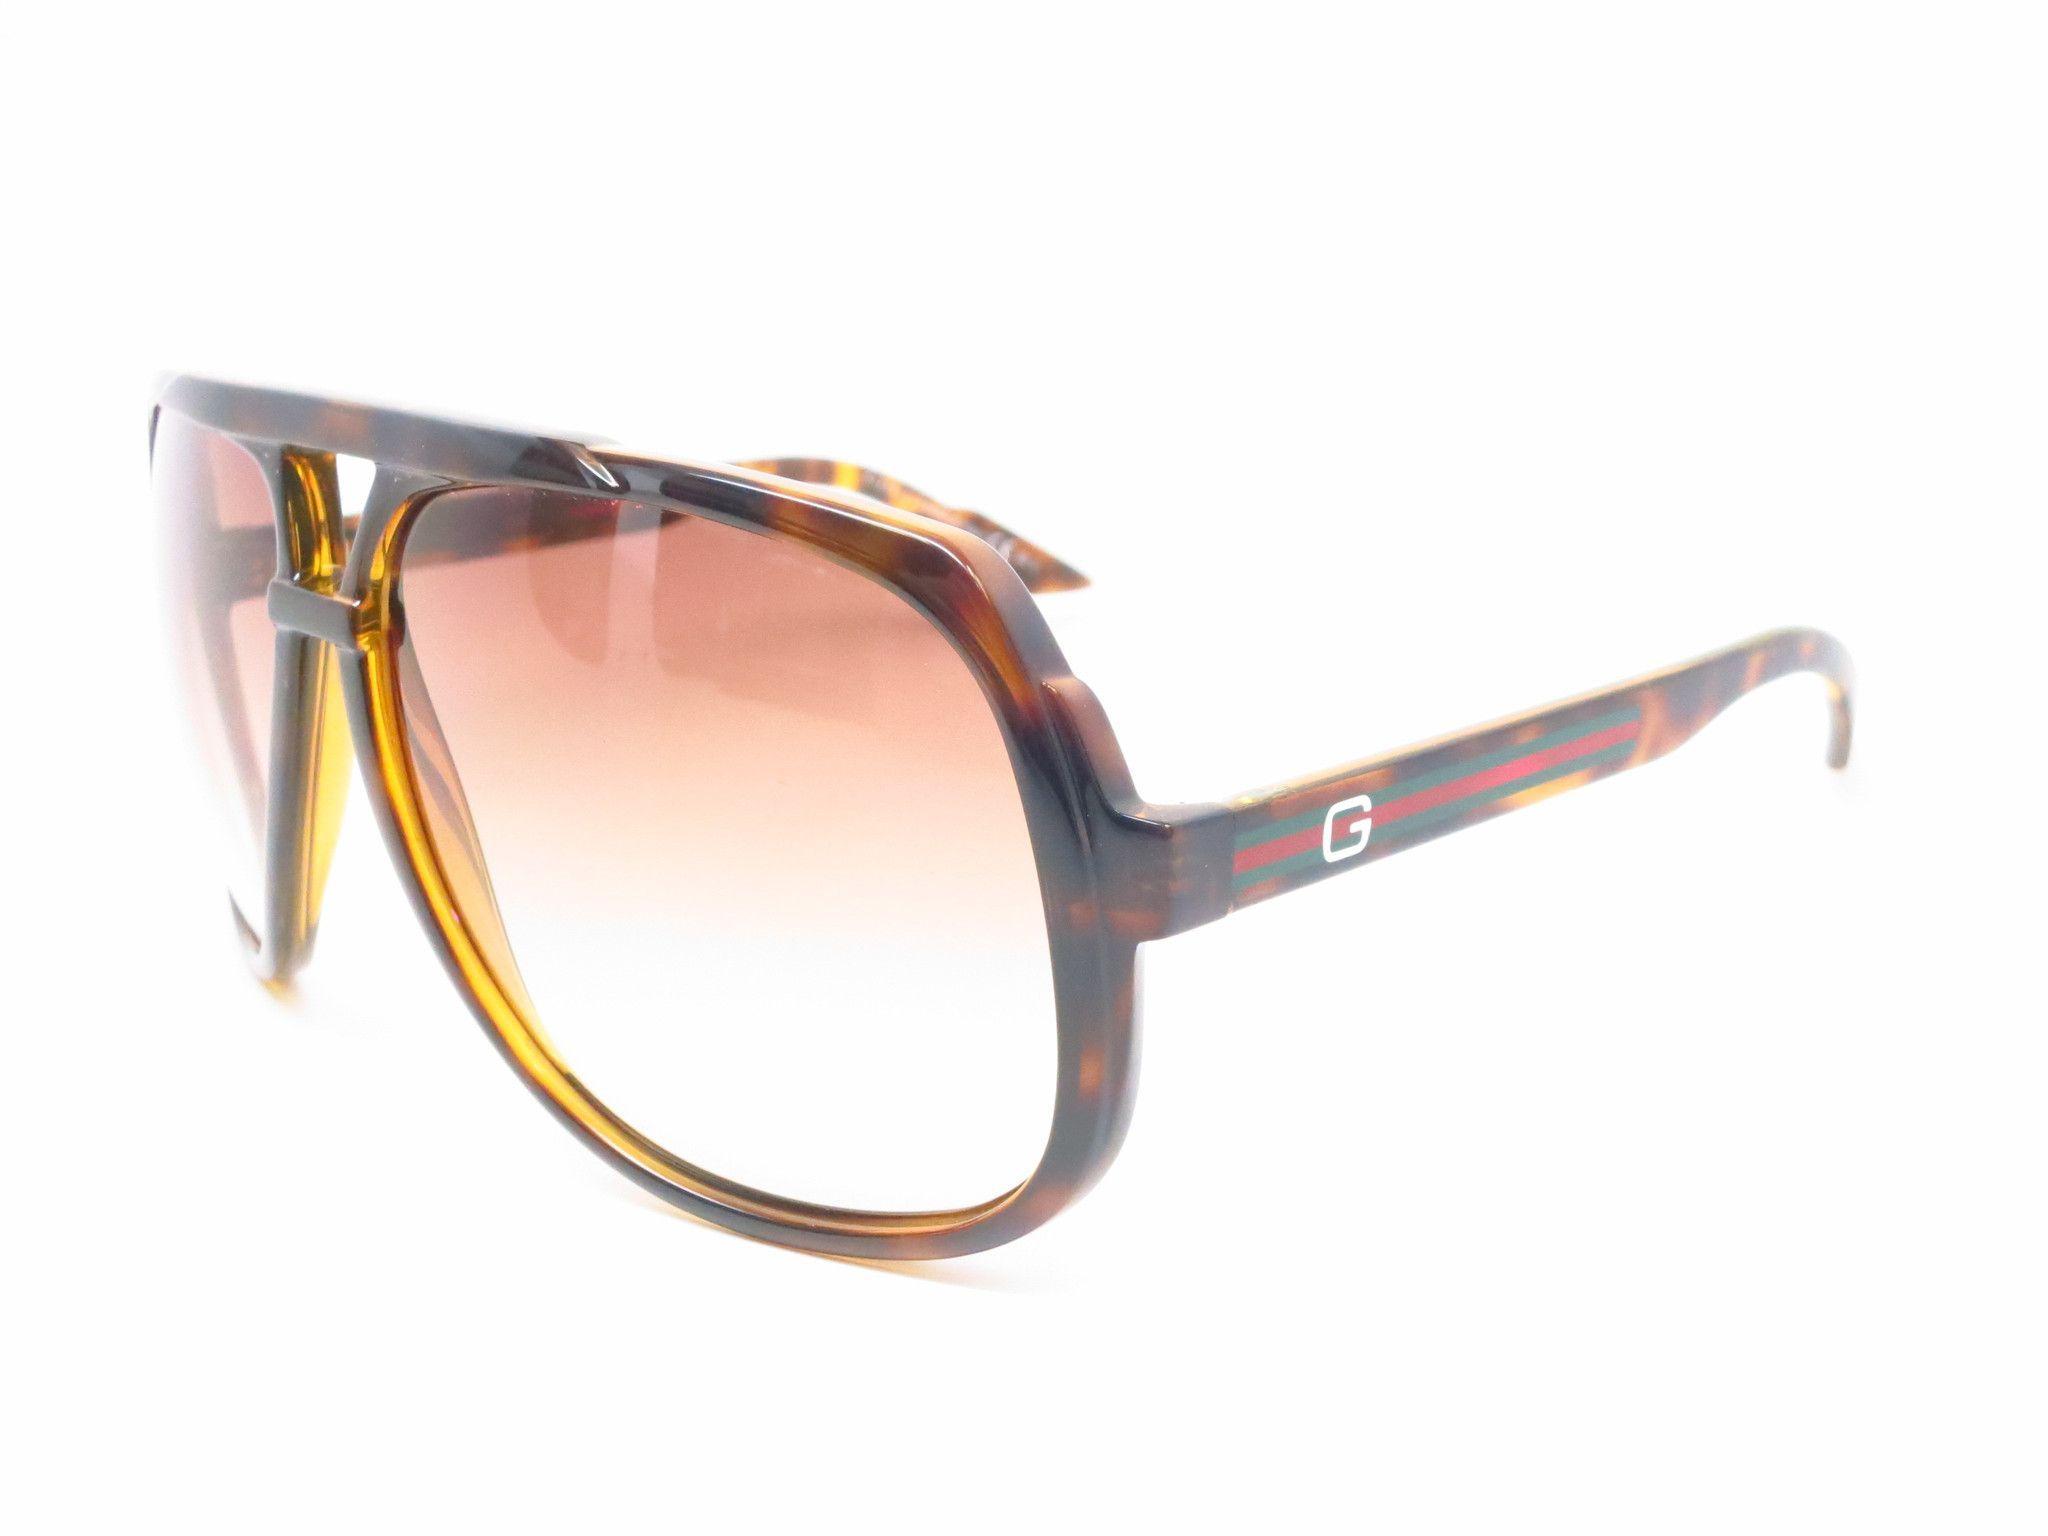 c8db64095bd Gucci GG 1622 GG1622 S Havana 7919M Sunglasses